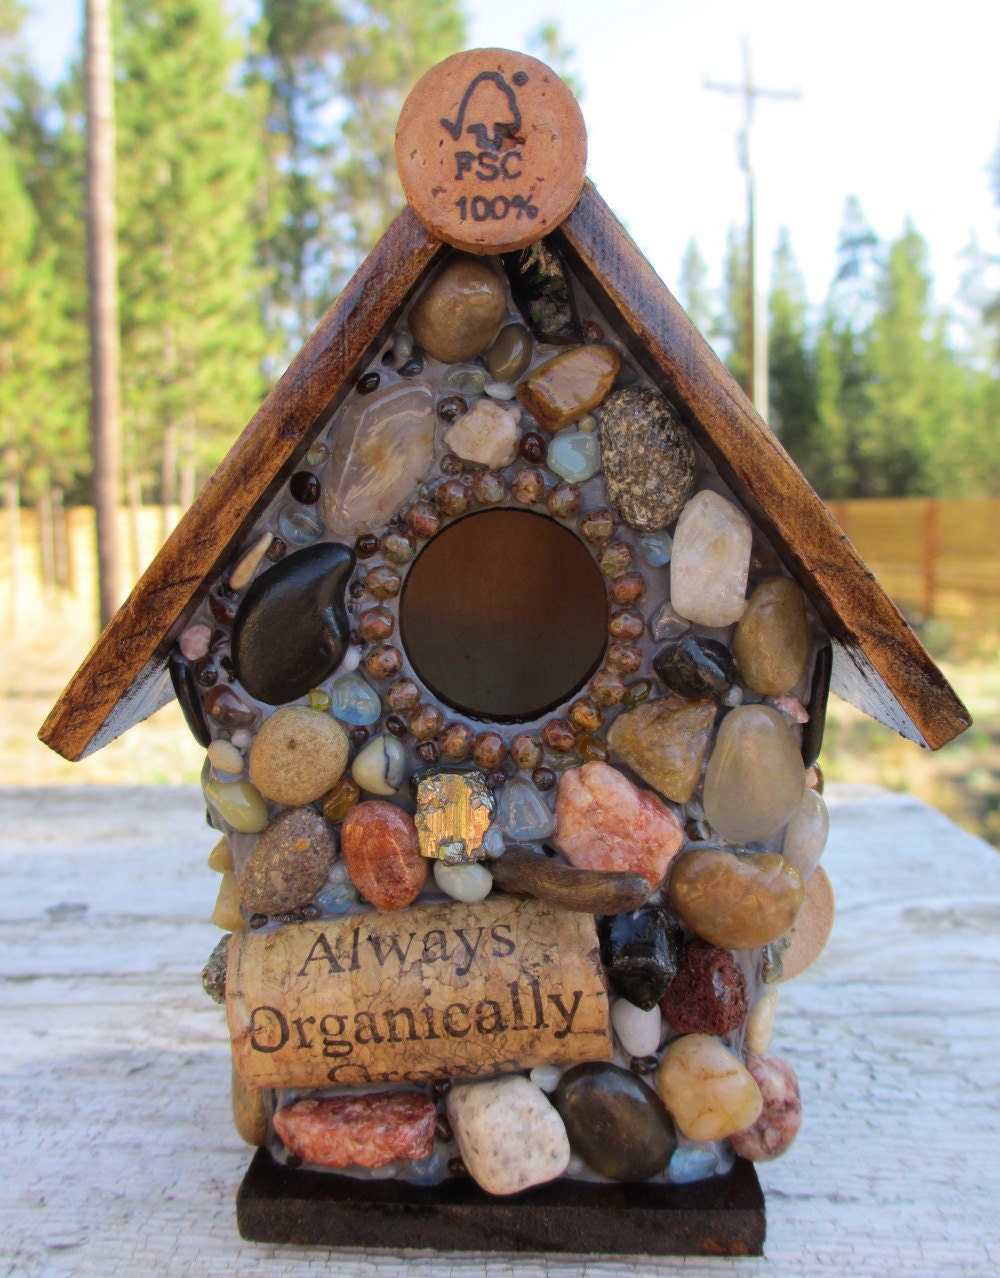 Organic Cork Birdhouse with Mosaic Stones